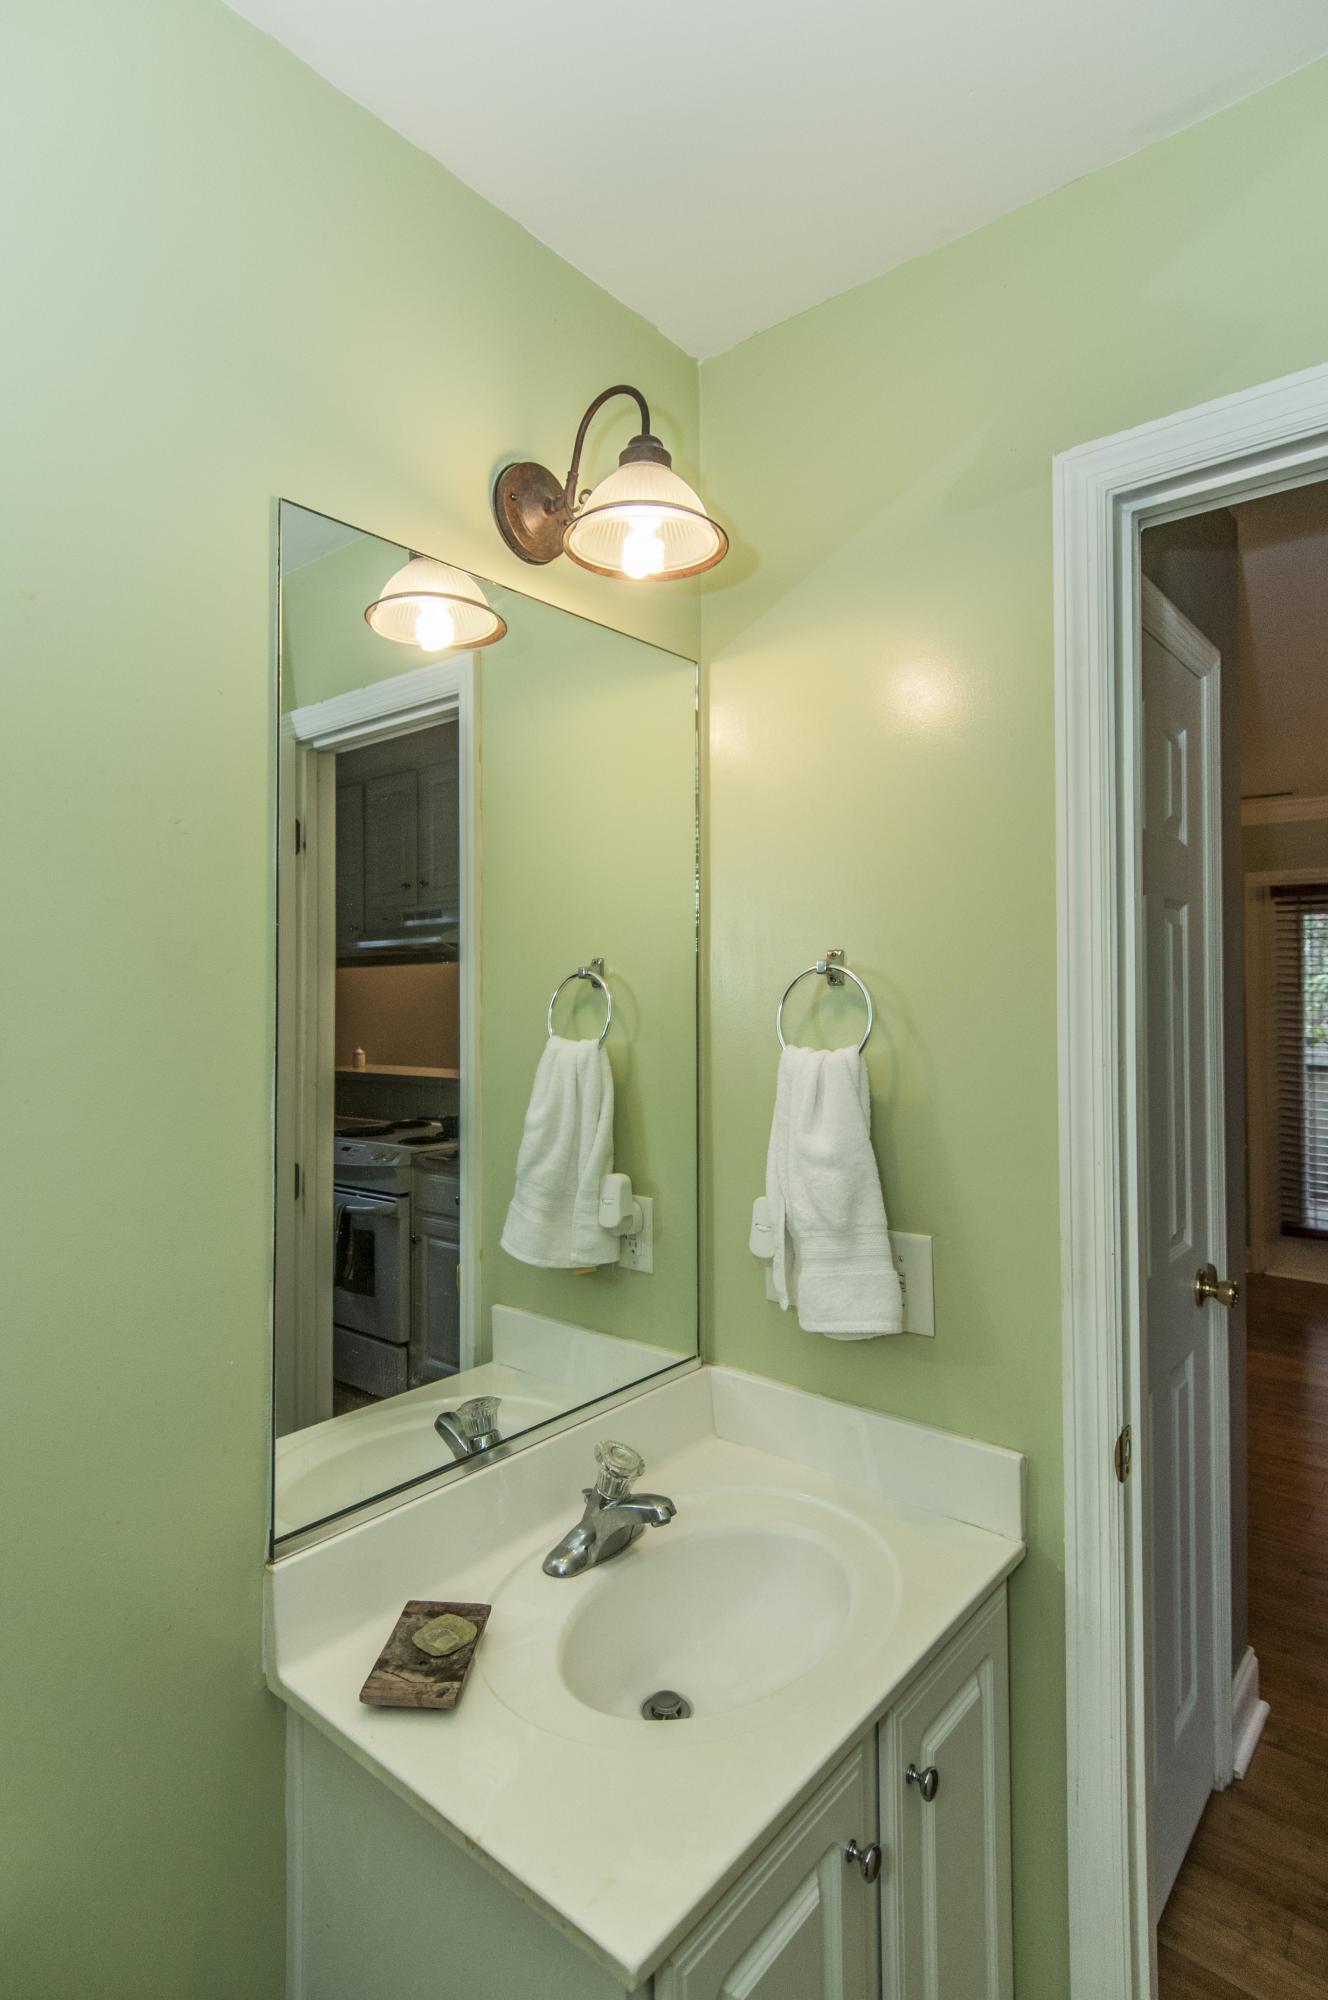 Longbranch Point Homes For Sale - 940 Estates, Charleston, SC - 3